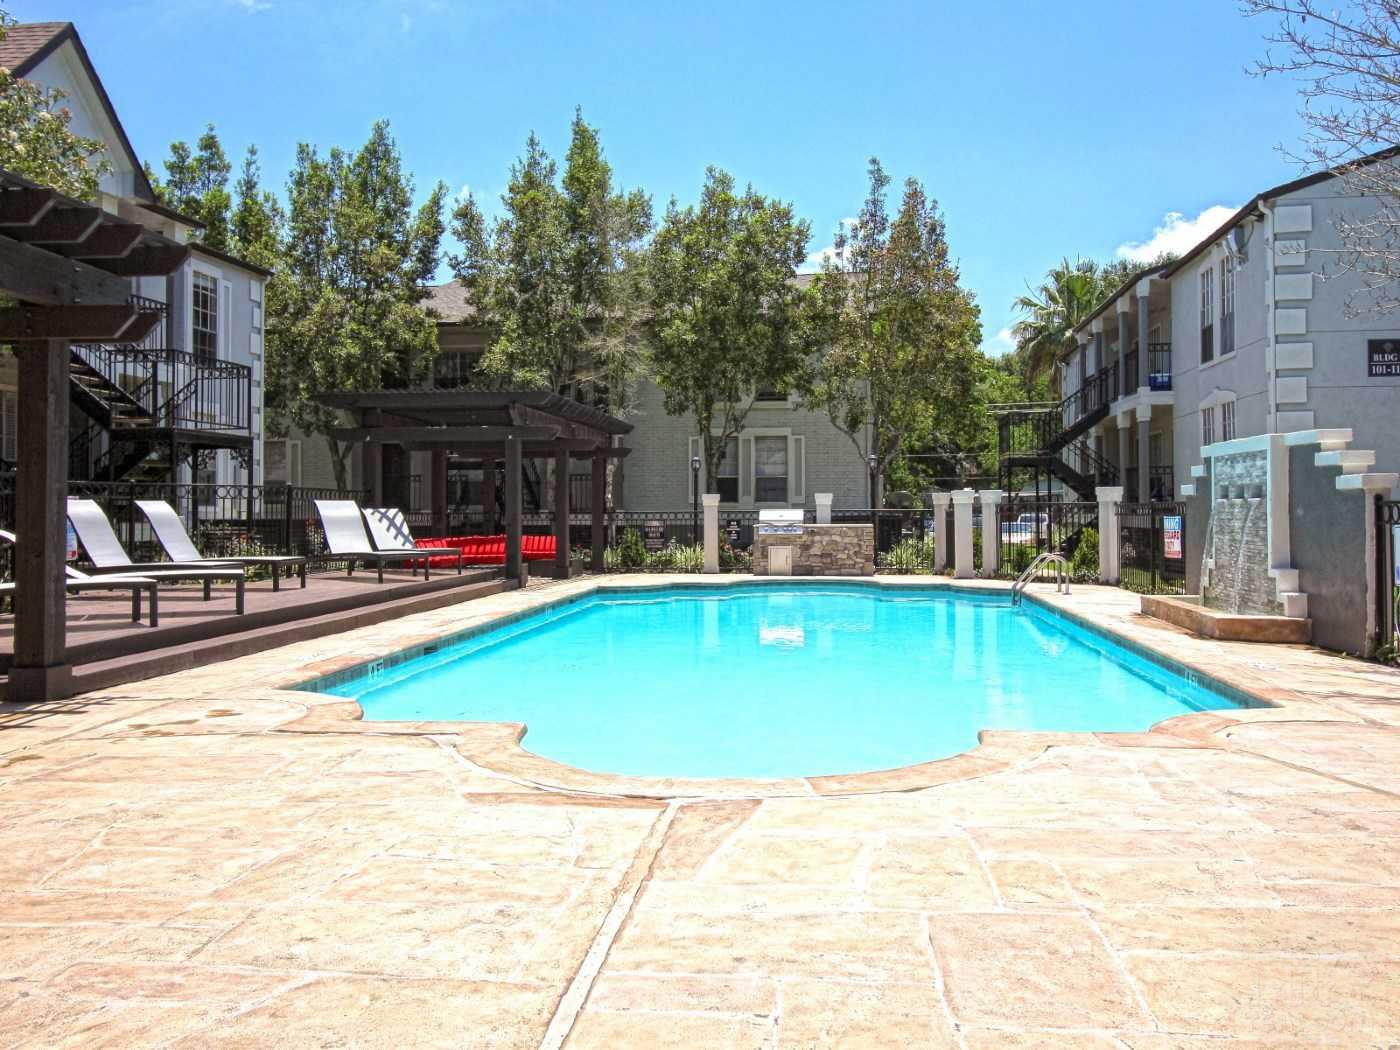 Pool Lounge Area at La Maison at Lake Cove Apartments in Seabrook, Texas